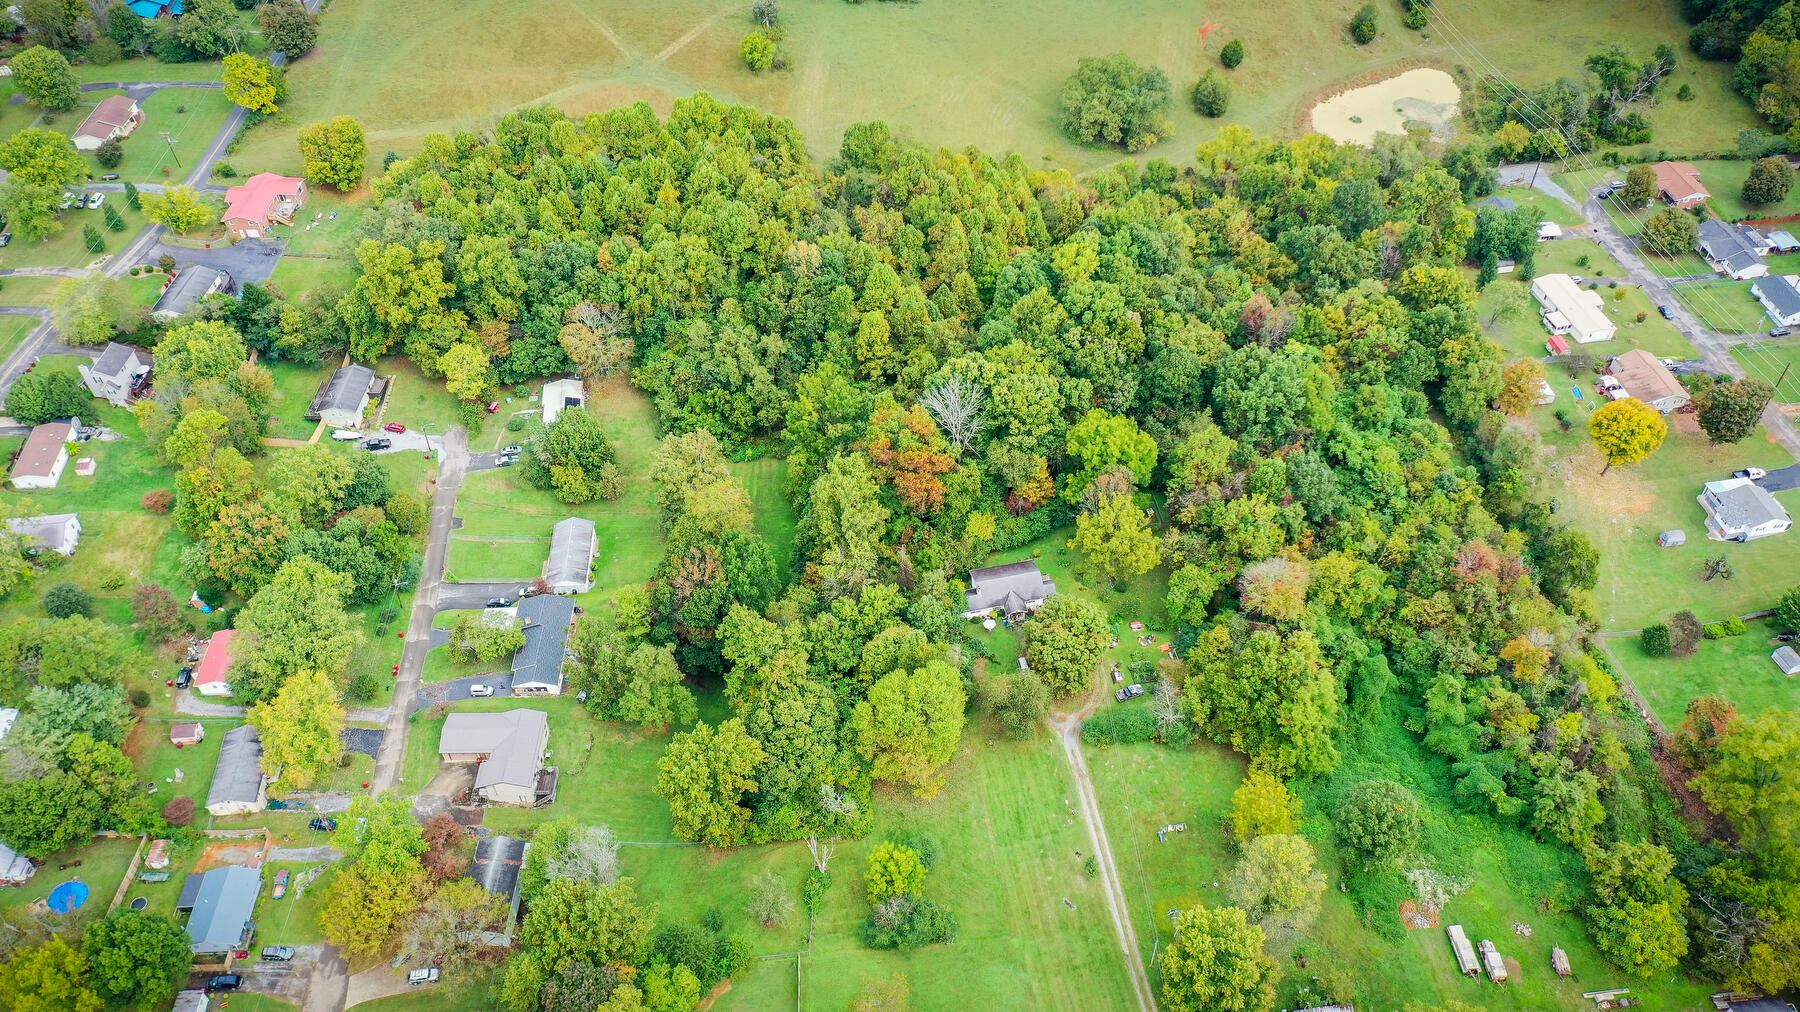 Photo of 000 Indian Ridge Rd Off, Johnson City, TN 37604 (MLS # 9929680)